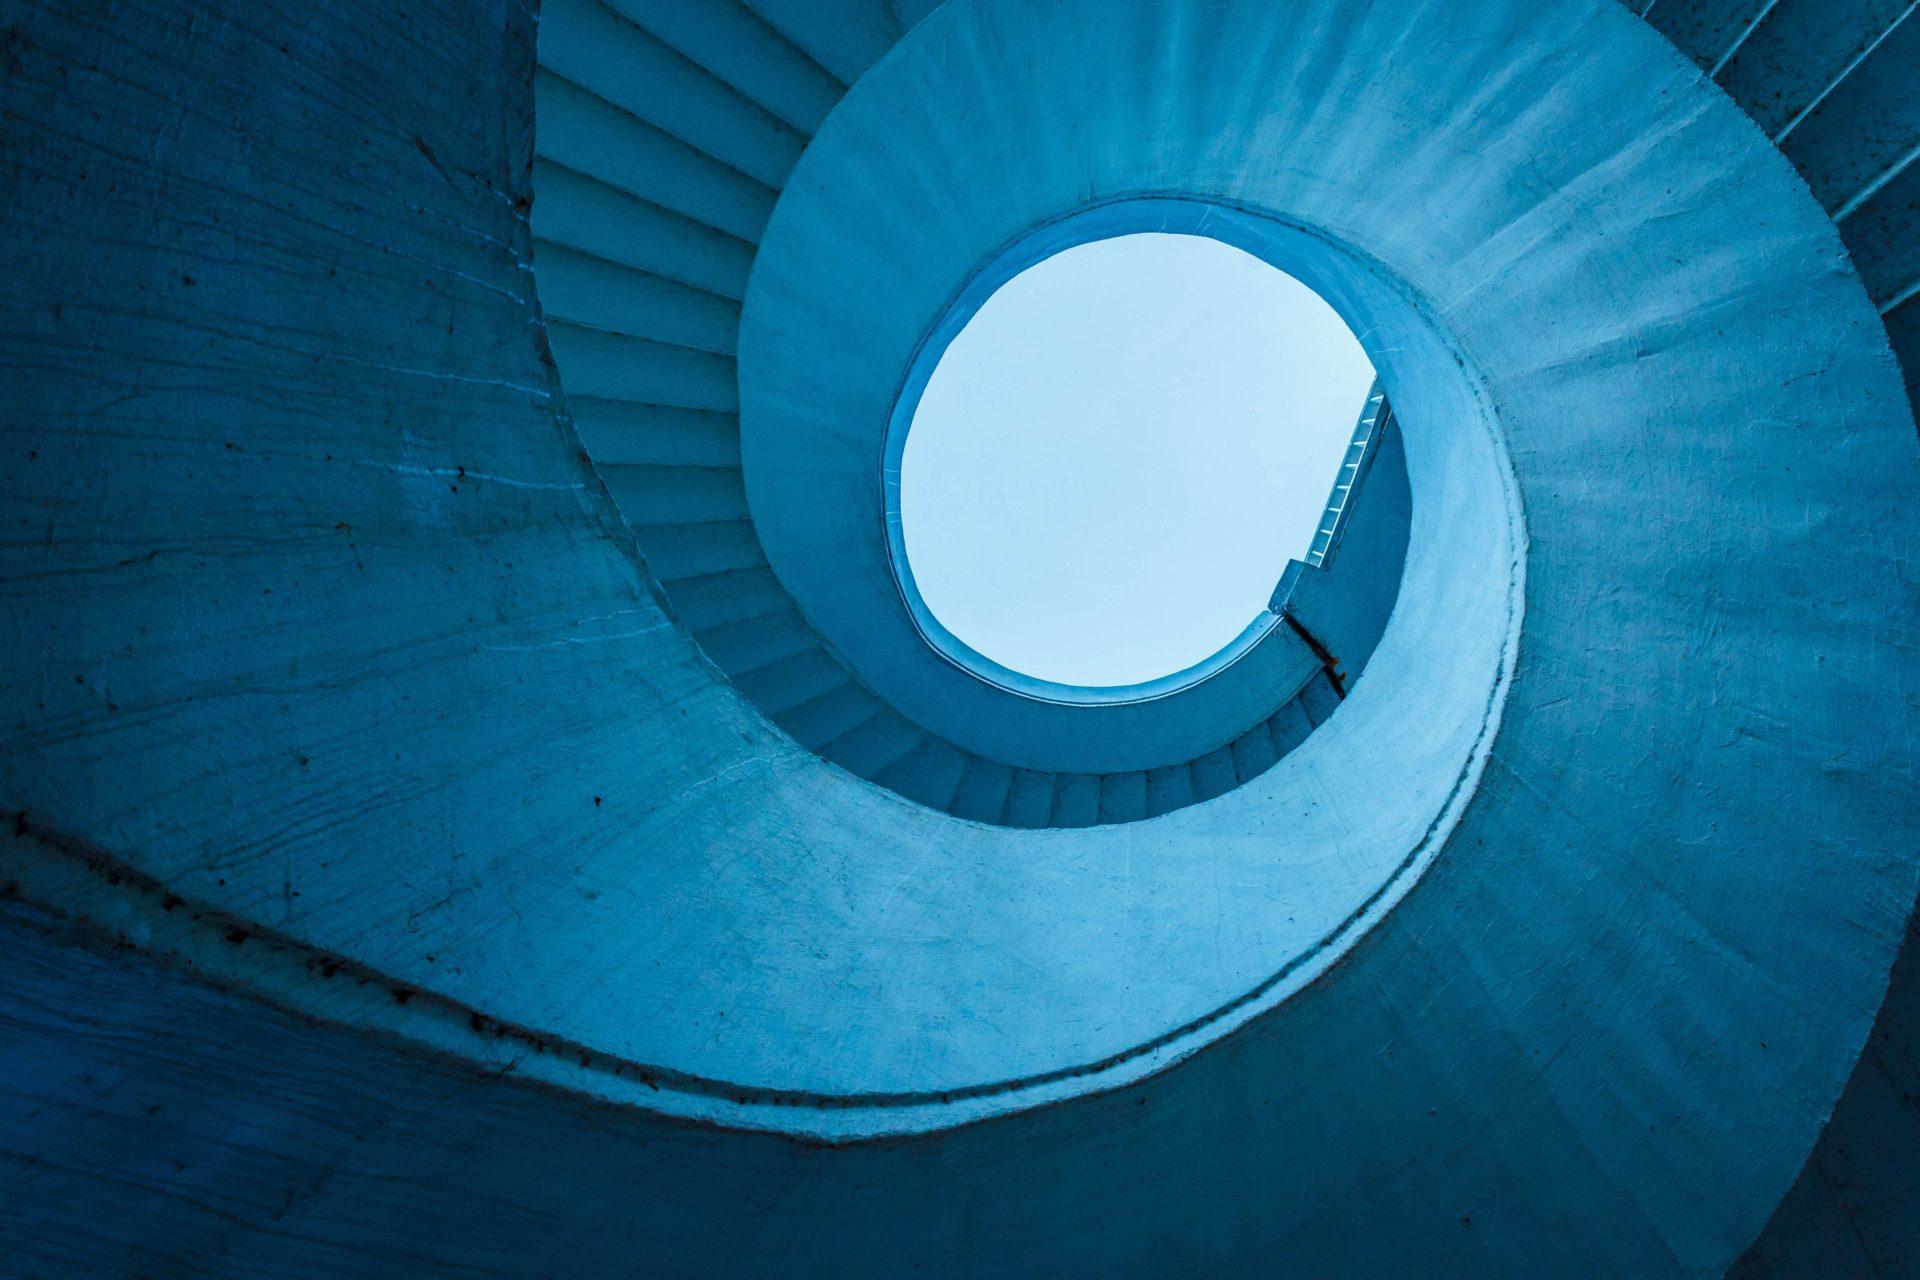 Snail Staircase